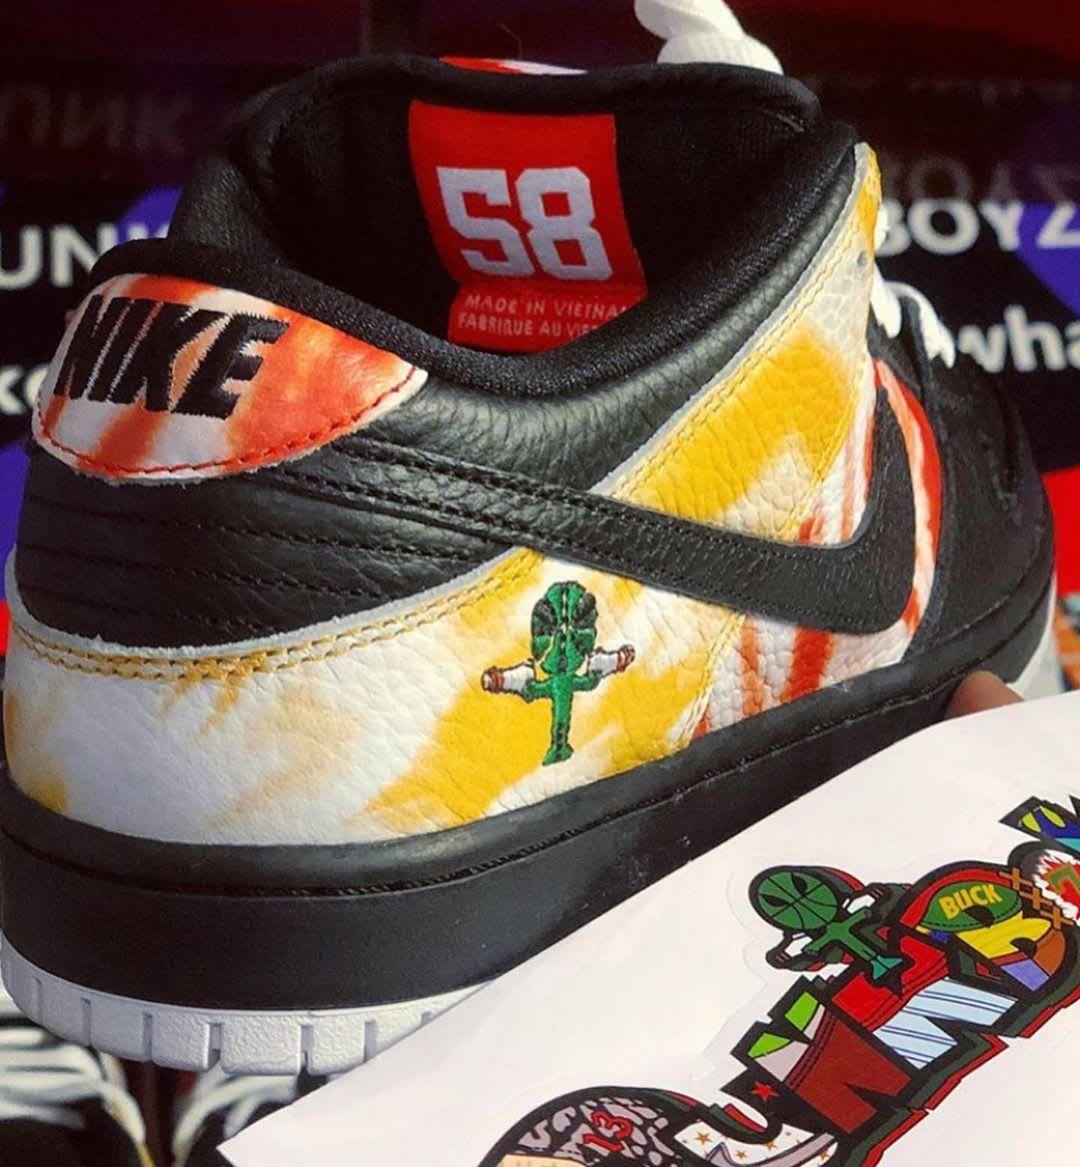 Nike's Dropping Tie-Dye 'Raygun' SB Dunks